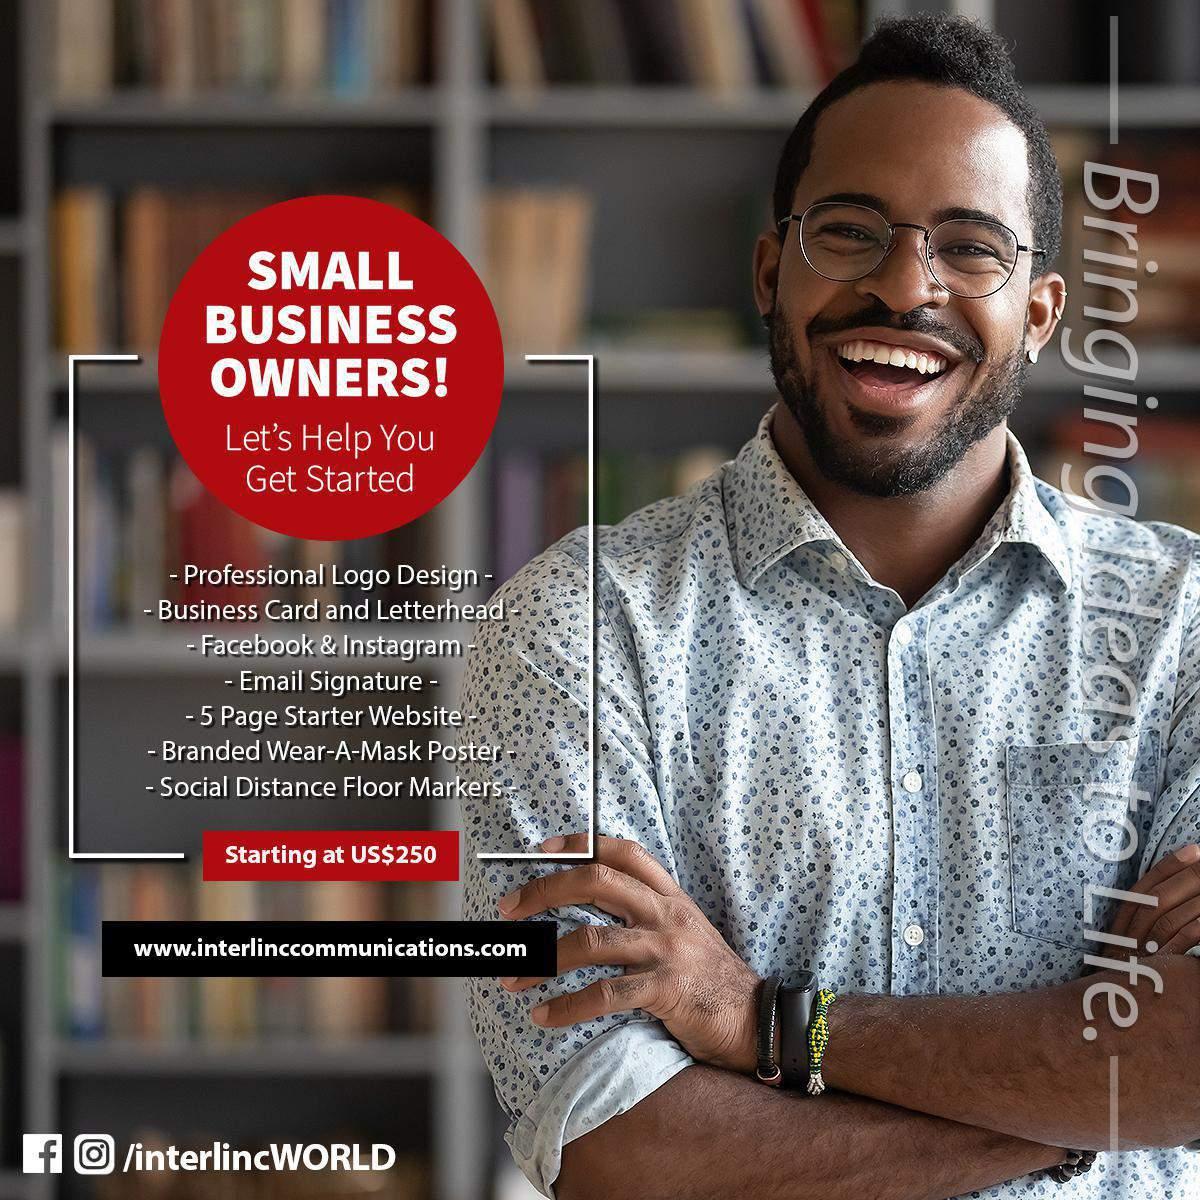 Creative Starter Small Business Design Solutions - Website, Logo & Branding, Business Cards, Website and more